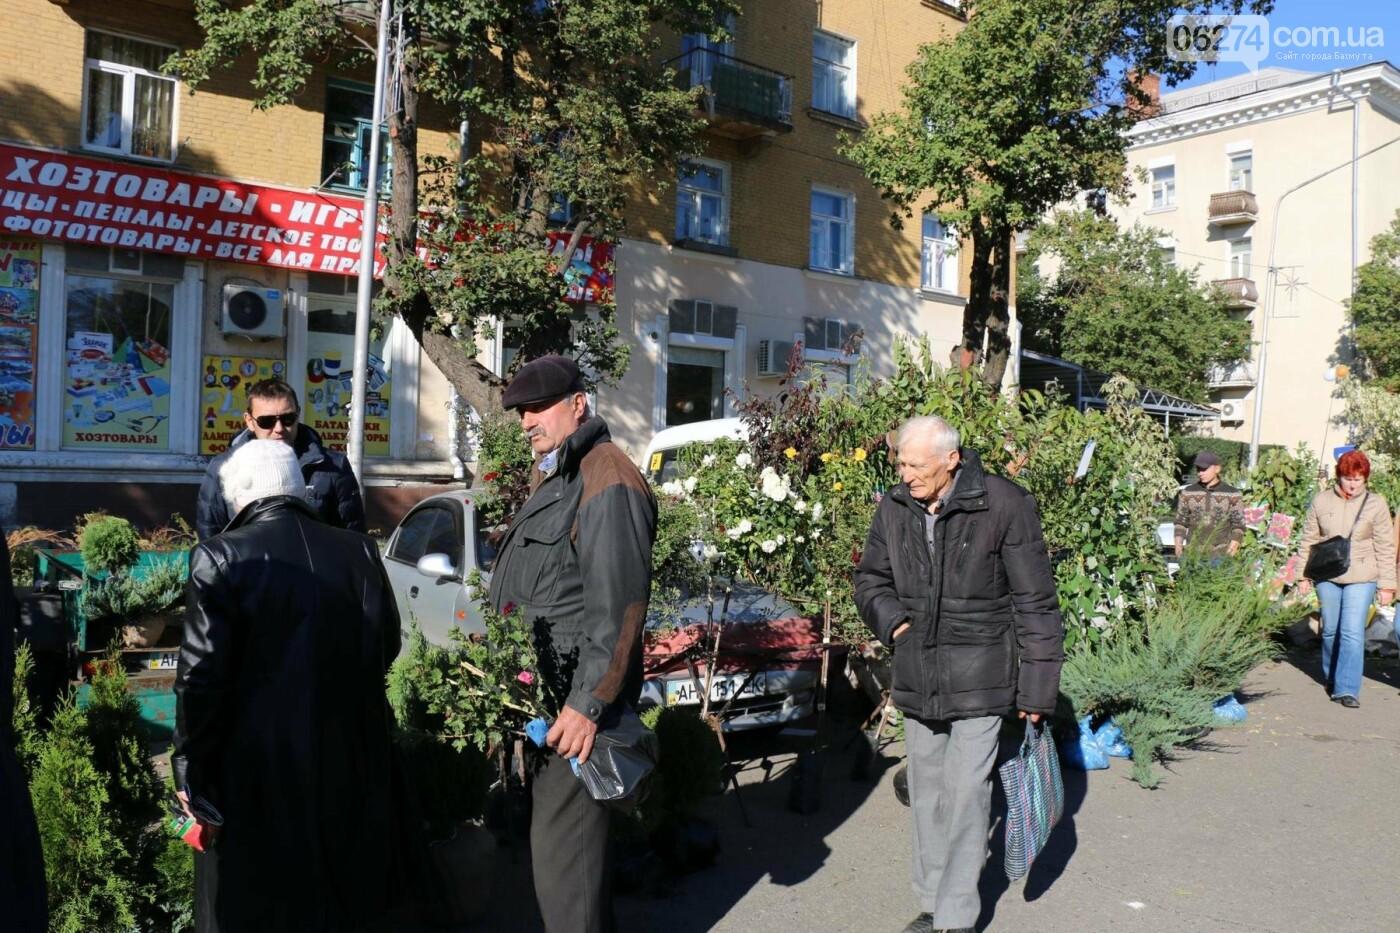 В Бахмуте прошла ярмарка «День садовода» (ФОТО), фото-19